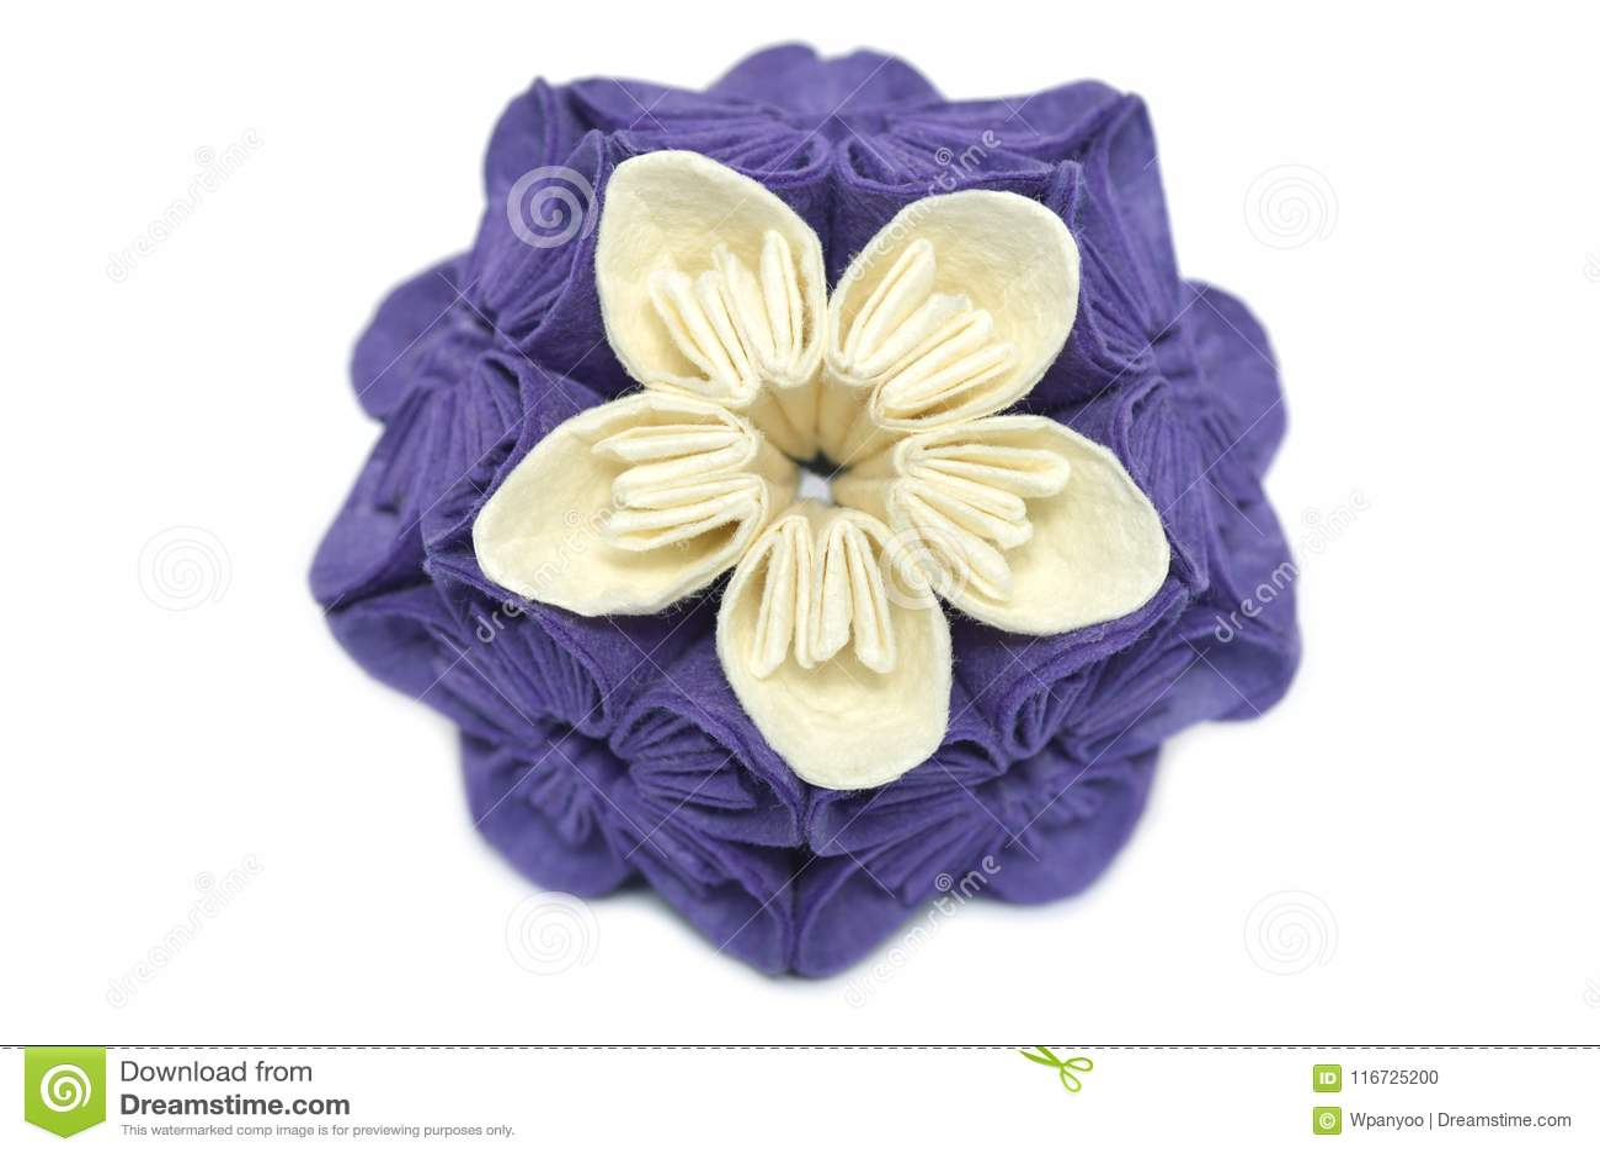 Purple And White Origami Kusudama Flower Stock Photo Image Of